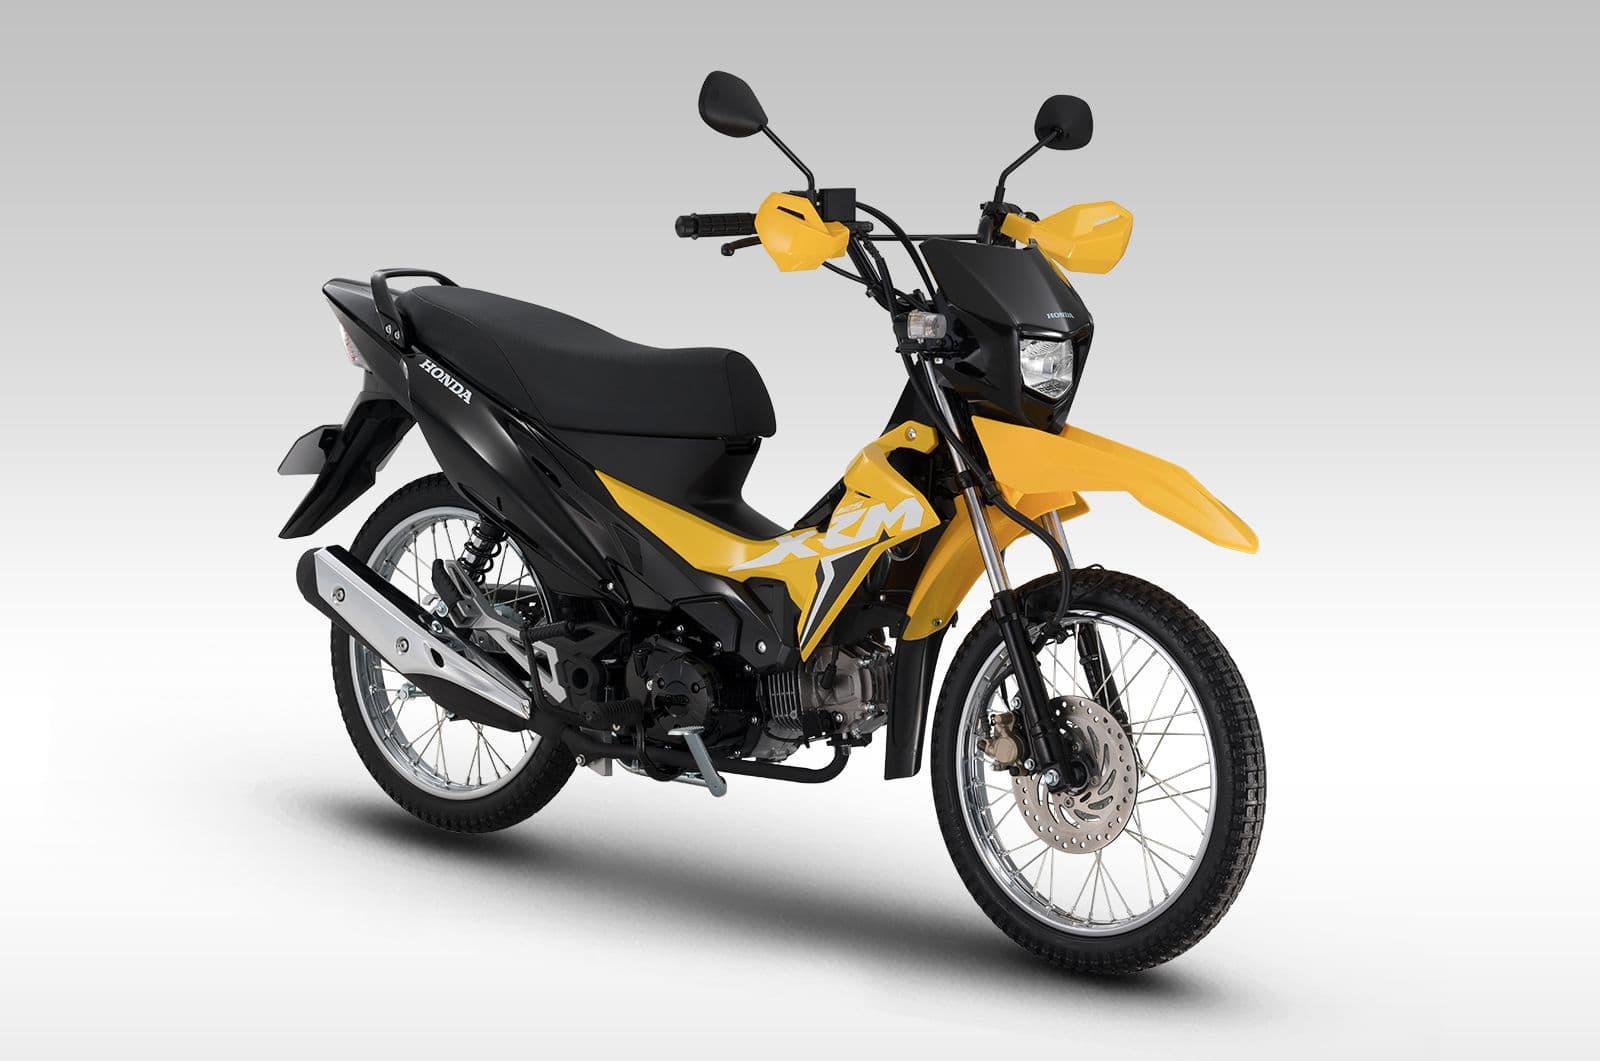 HONDA XRM 125 Dual Sport Fi